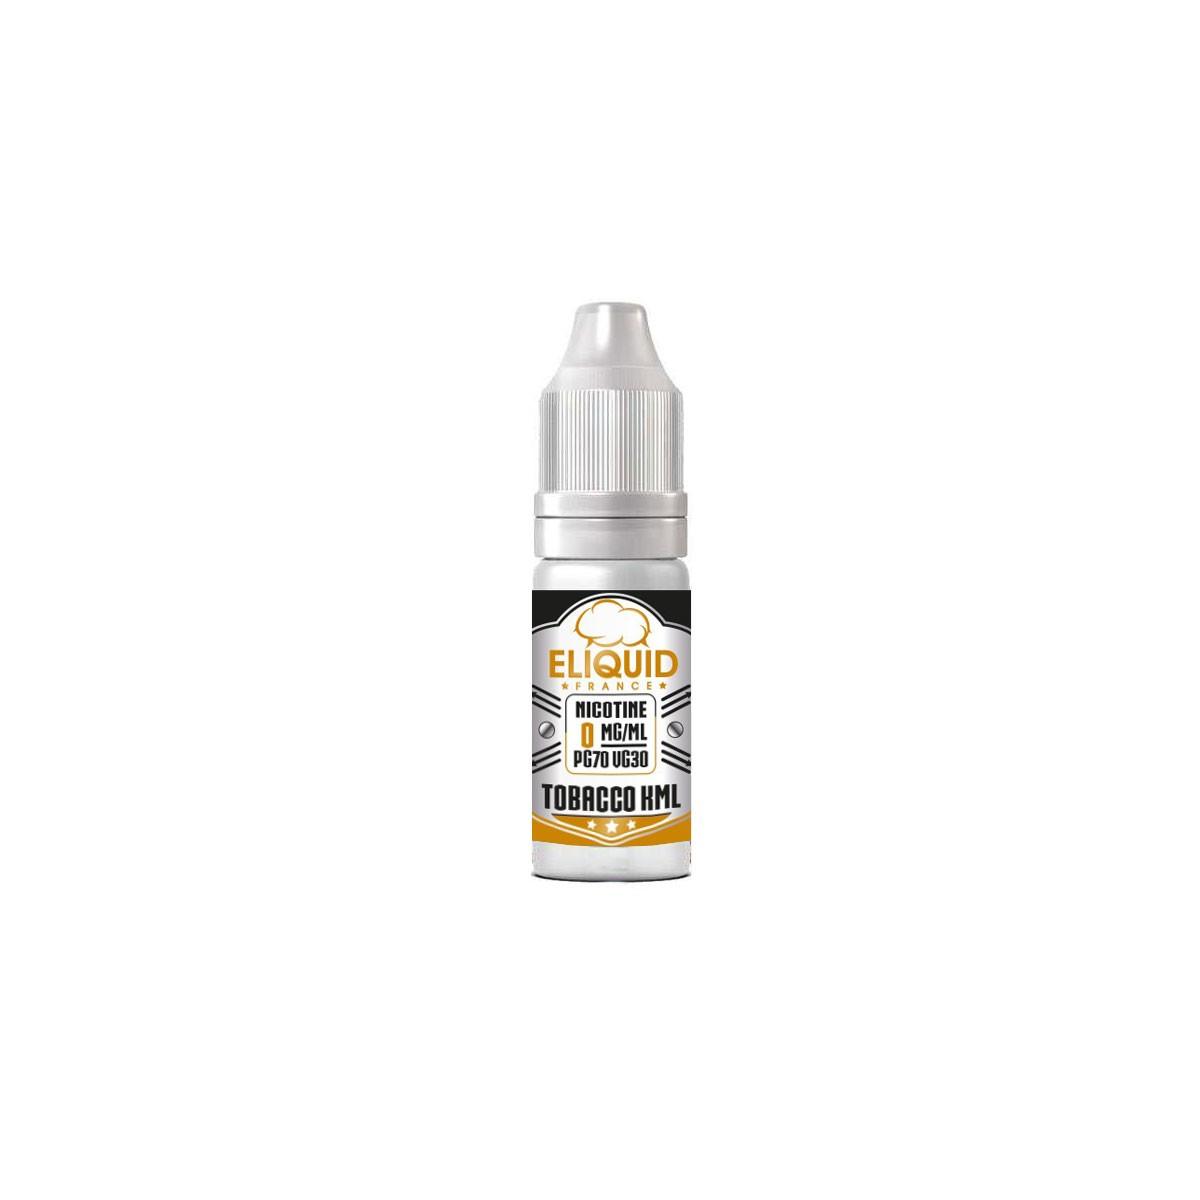 Eliquid France -  Tobacco KML (Classico KML) 10ml-0mg/ml